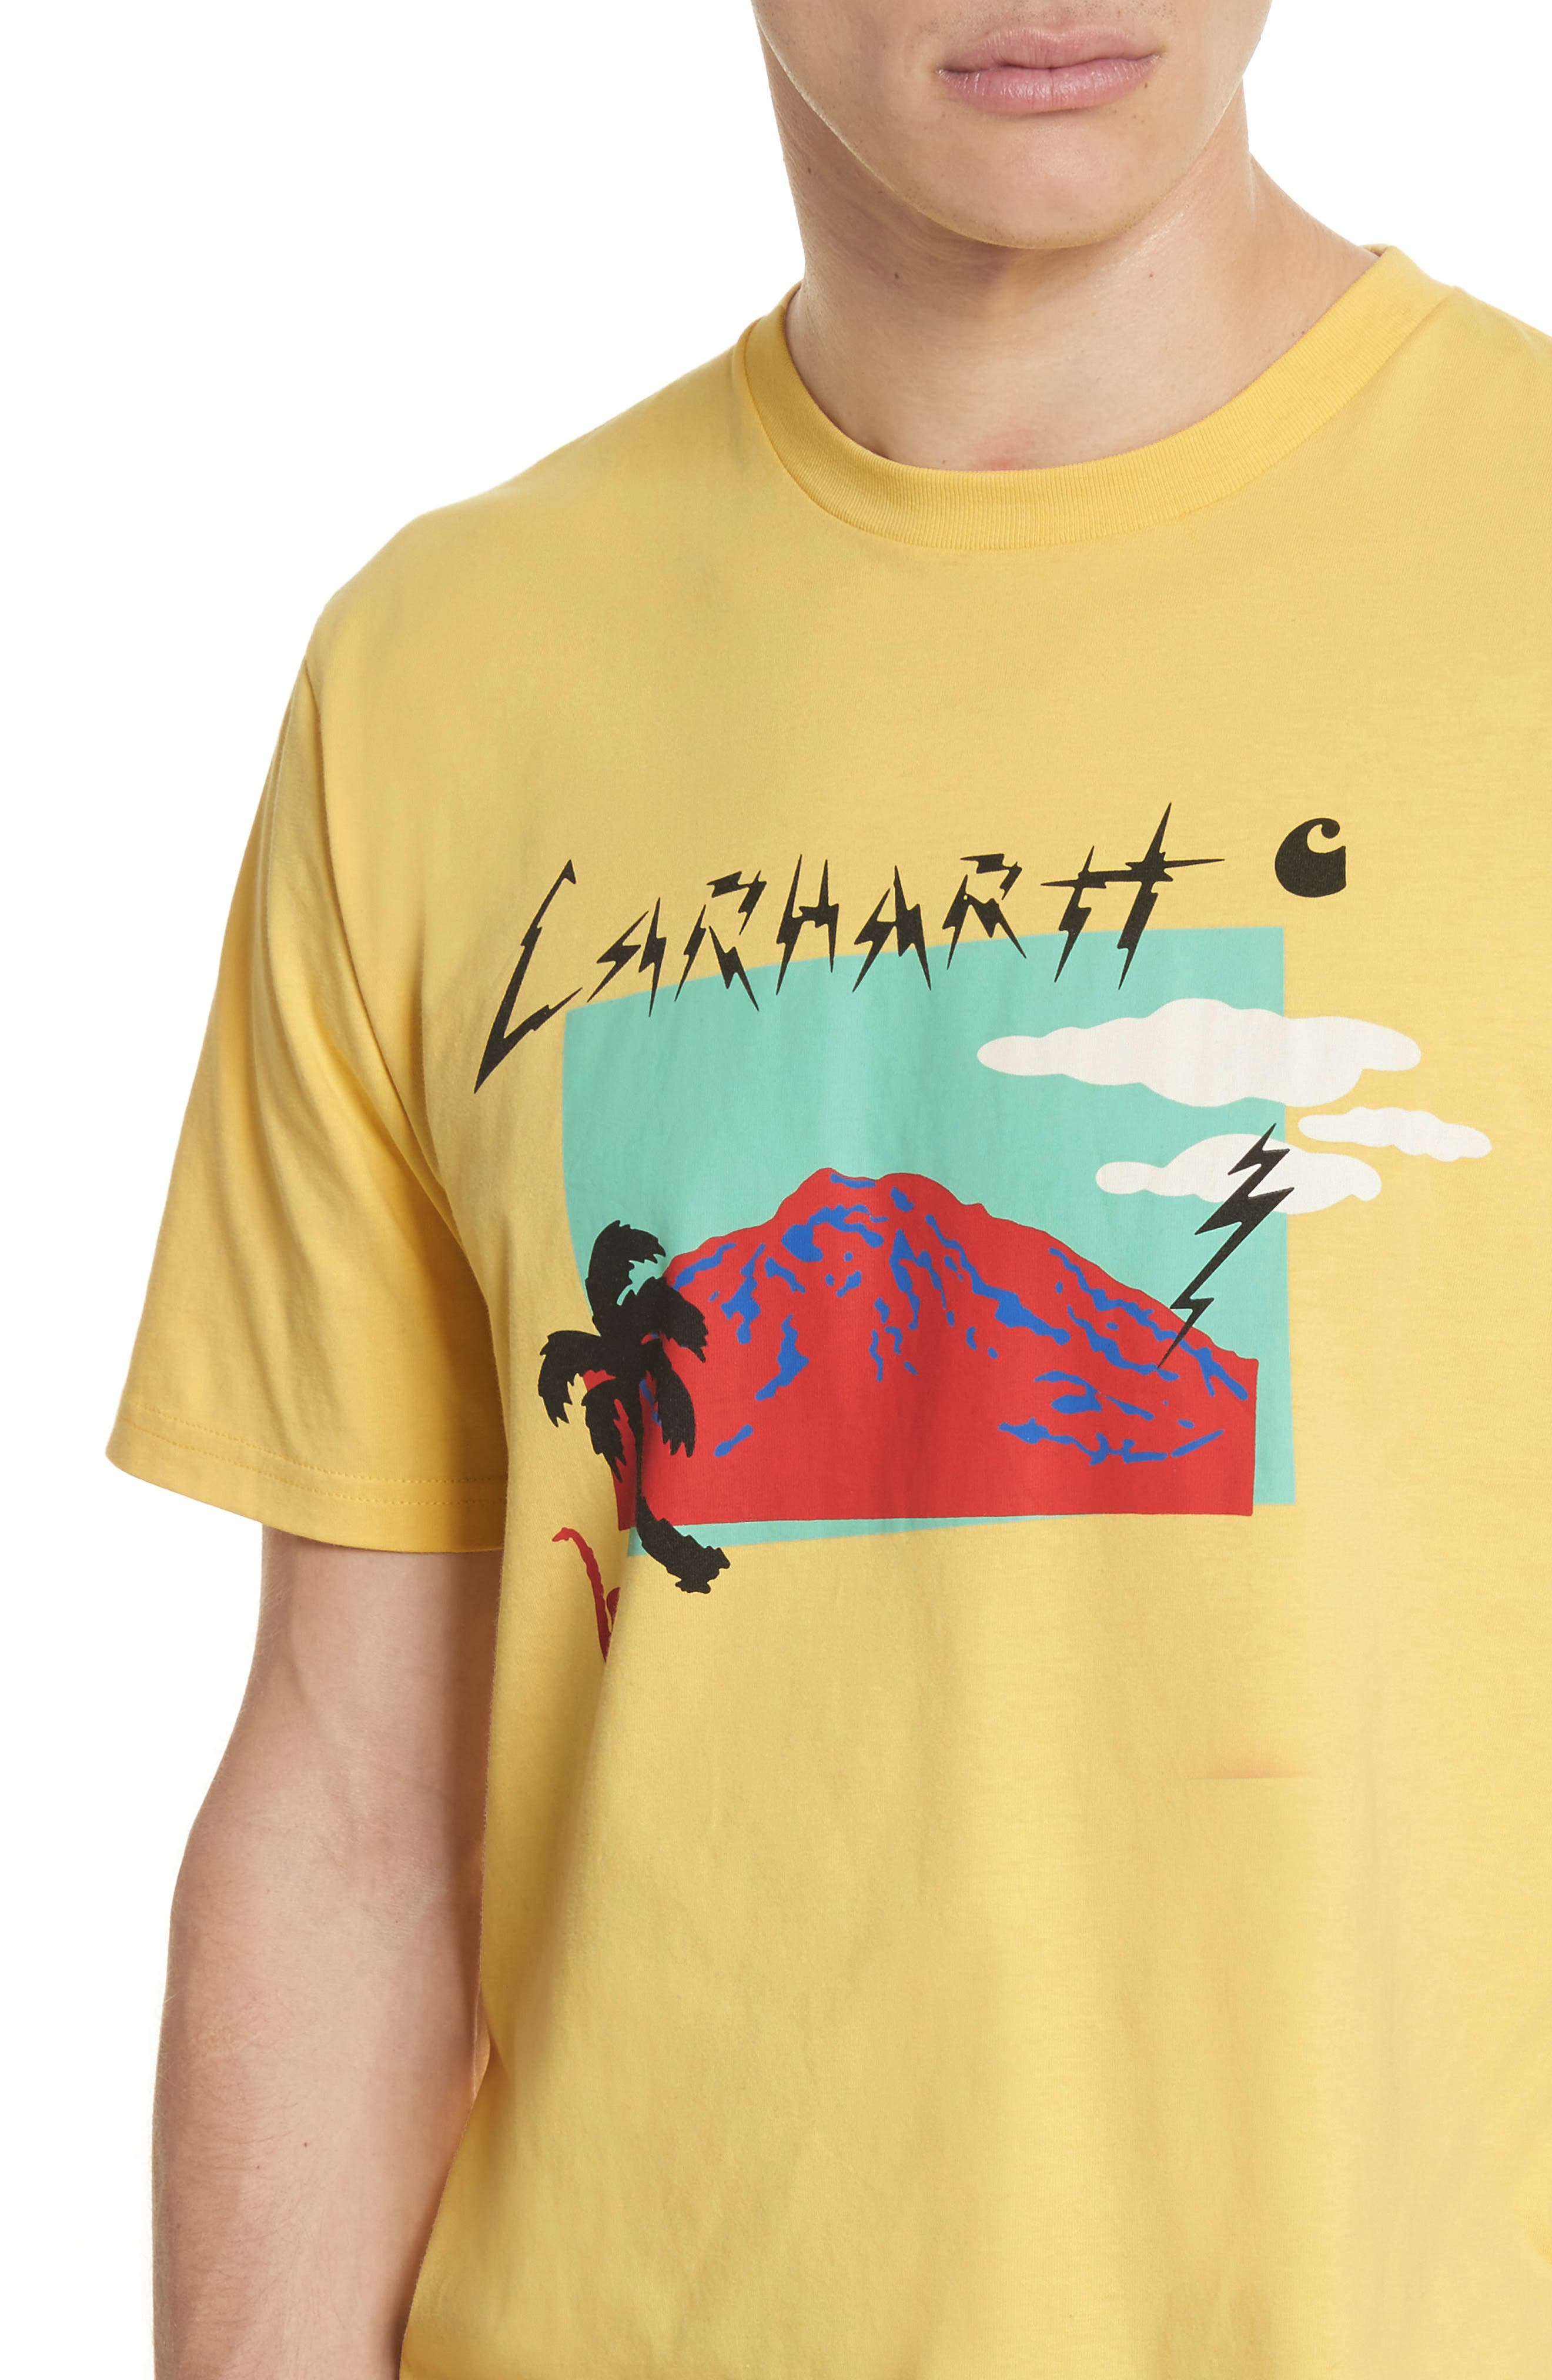 Anderson T-Shirt,                             Alternate thumbnail 4, color,                             750